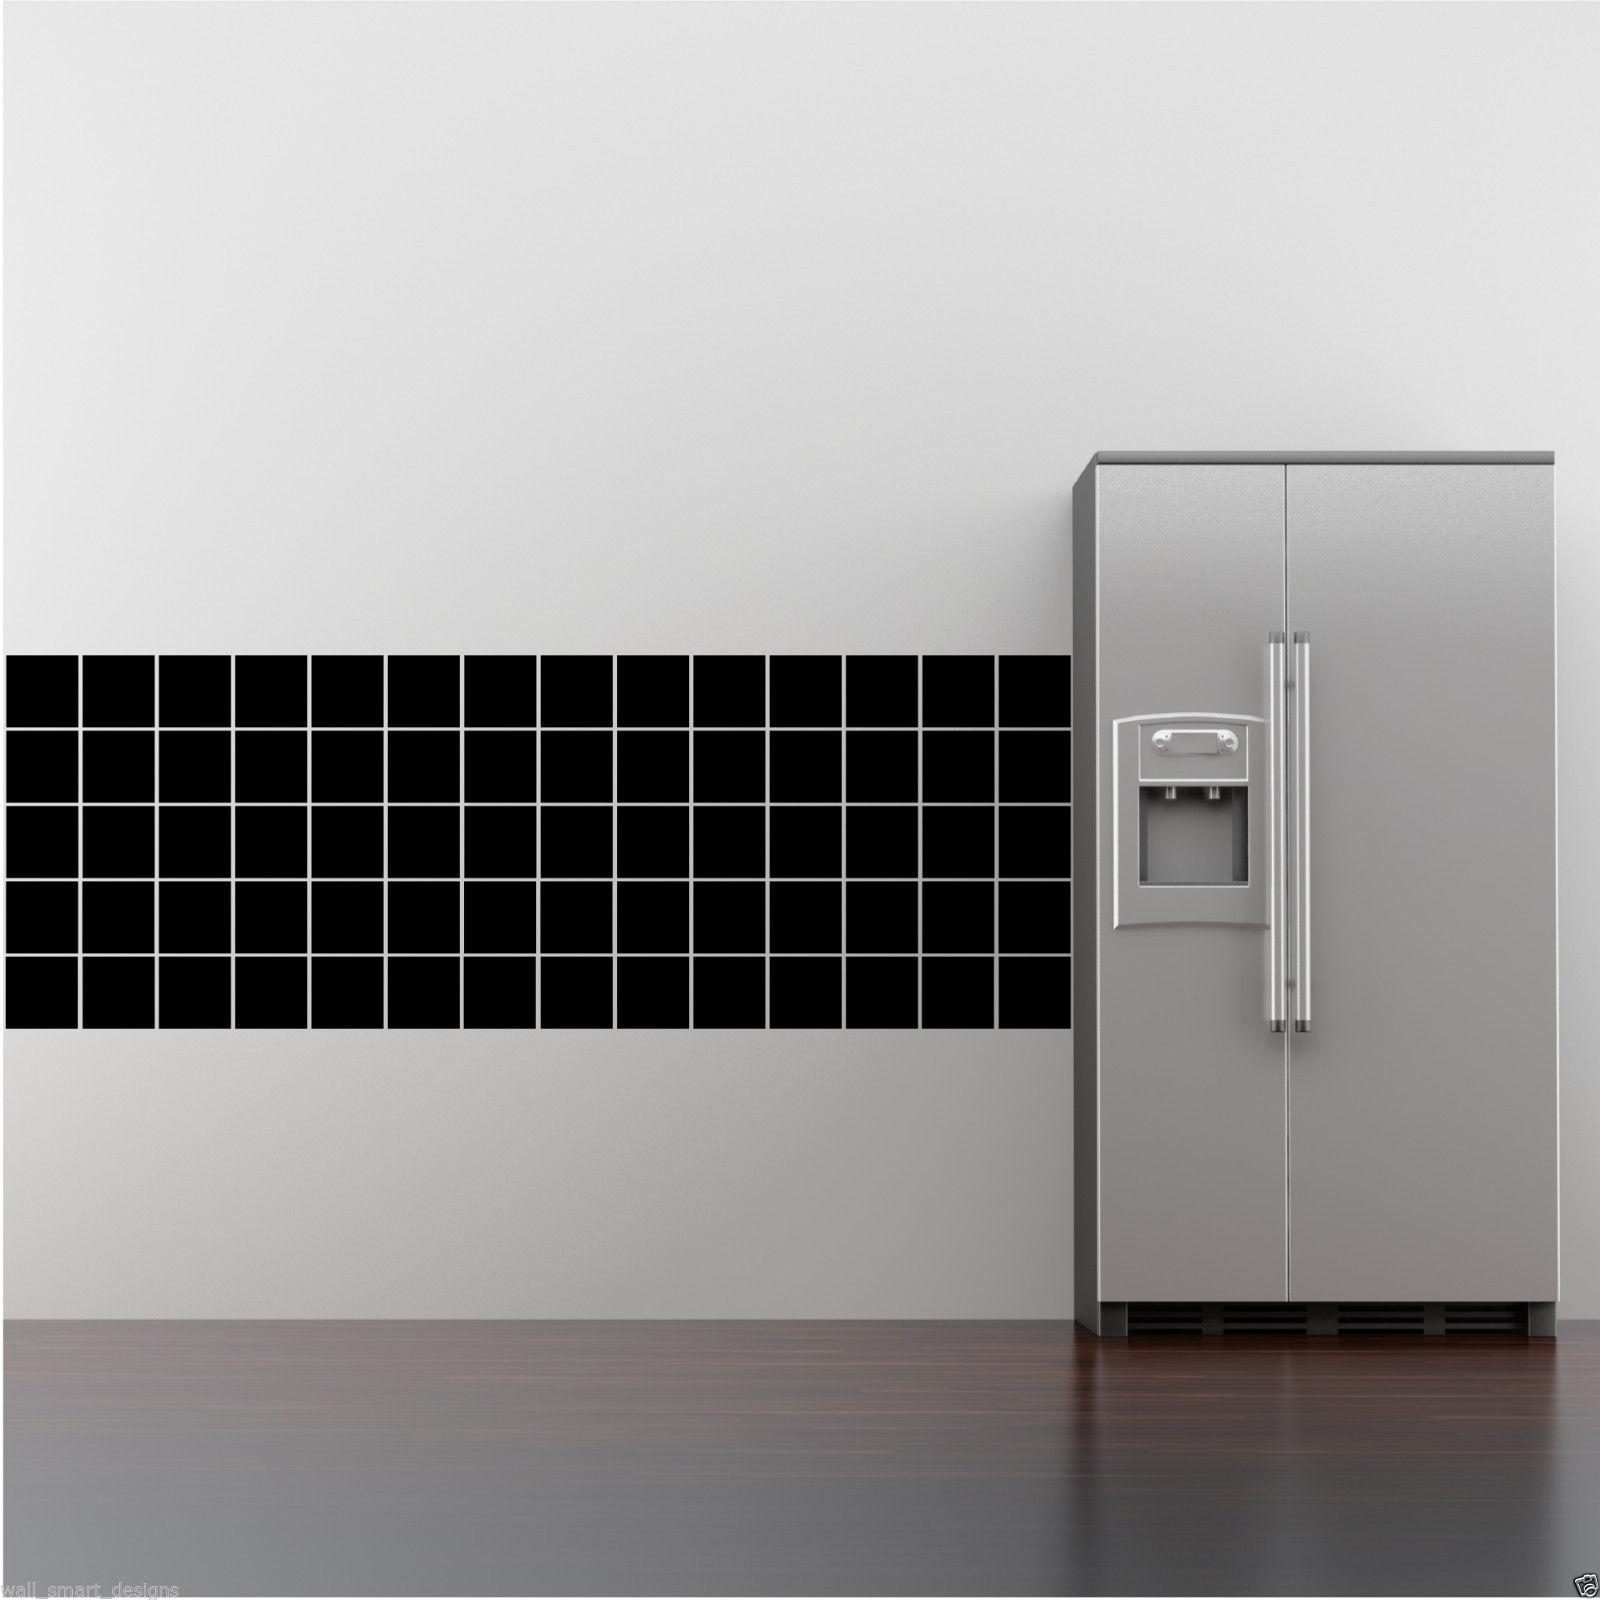 30 WALL ART TILE STICKERS FAKE BATHROOM KITCHEN